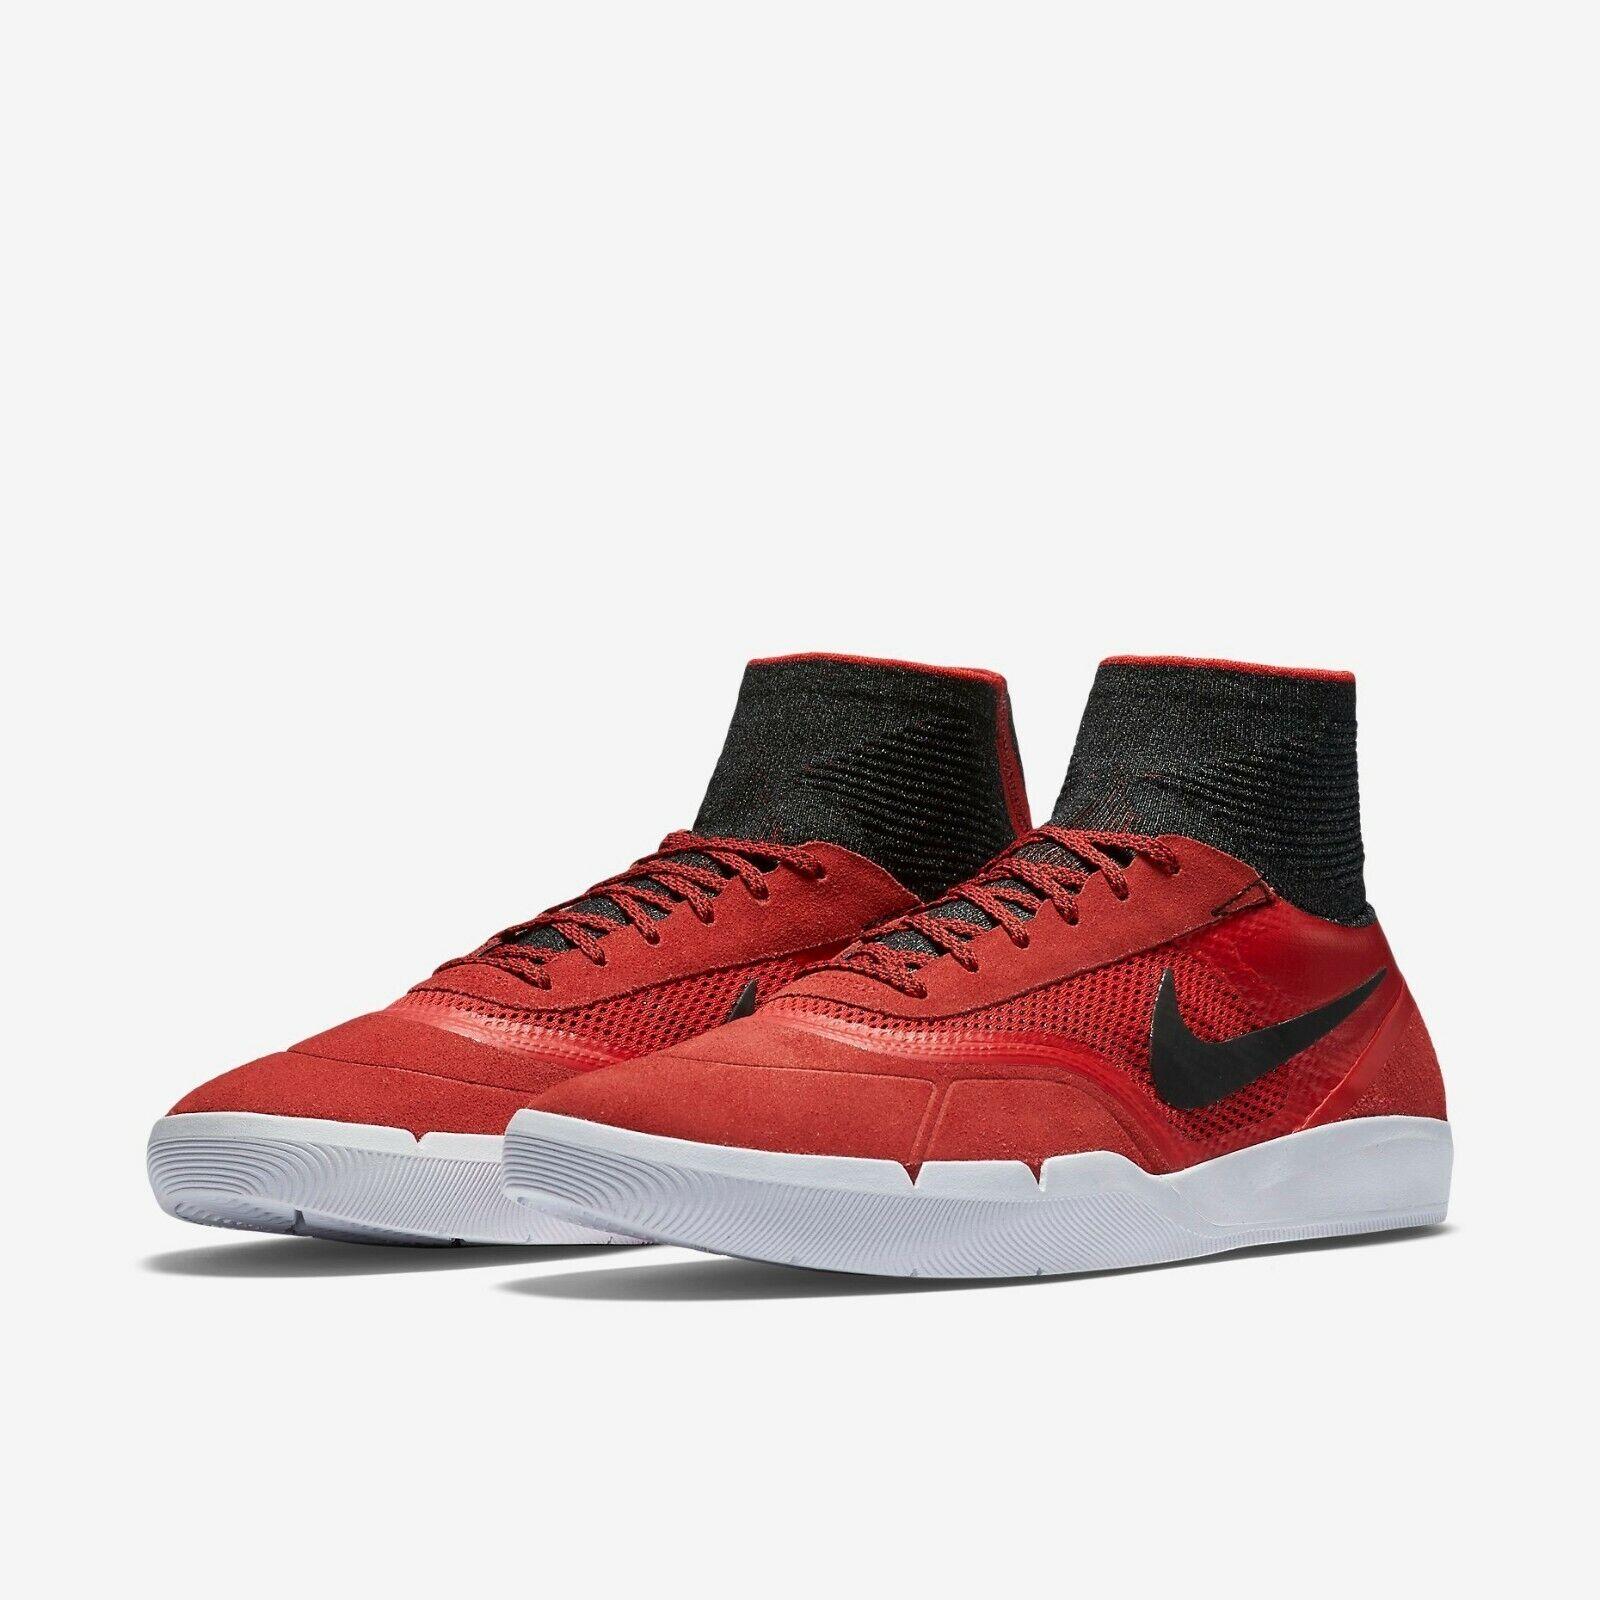 importar Espacioso estático  Nike SB Koston 3 Skateboarding Shoes Size 13 Hyperfeel White Blue BMX Skate  for sale online | eBay